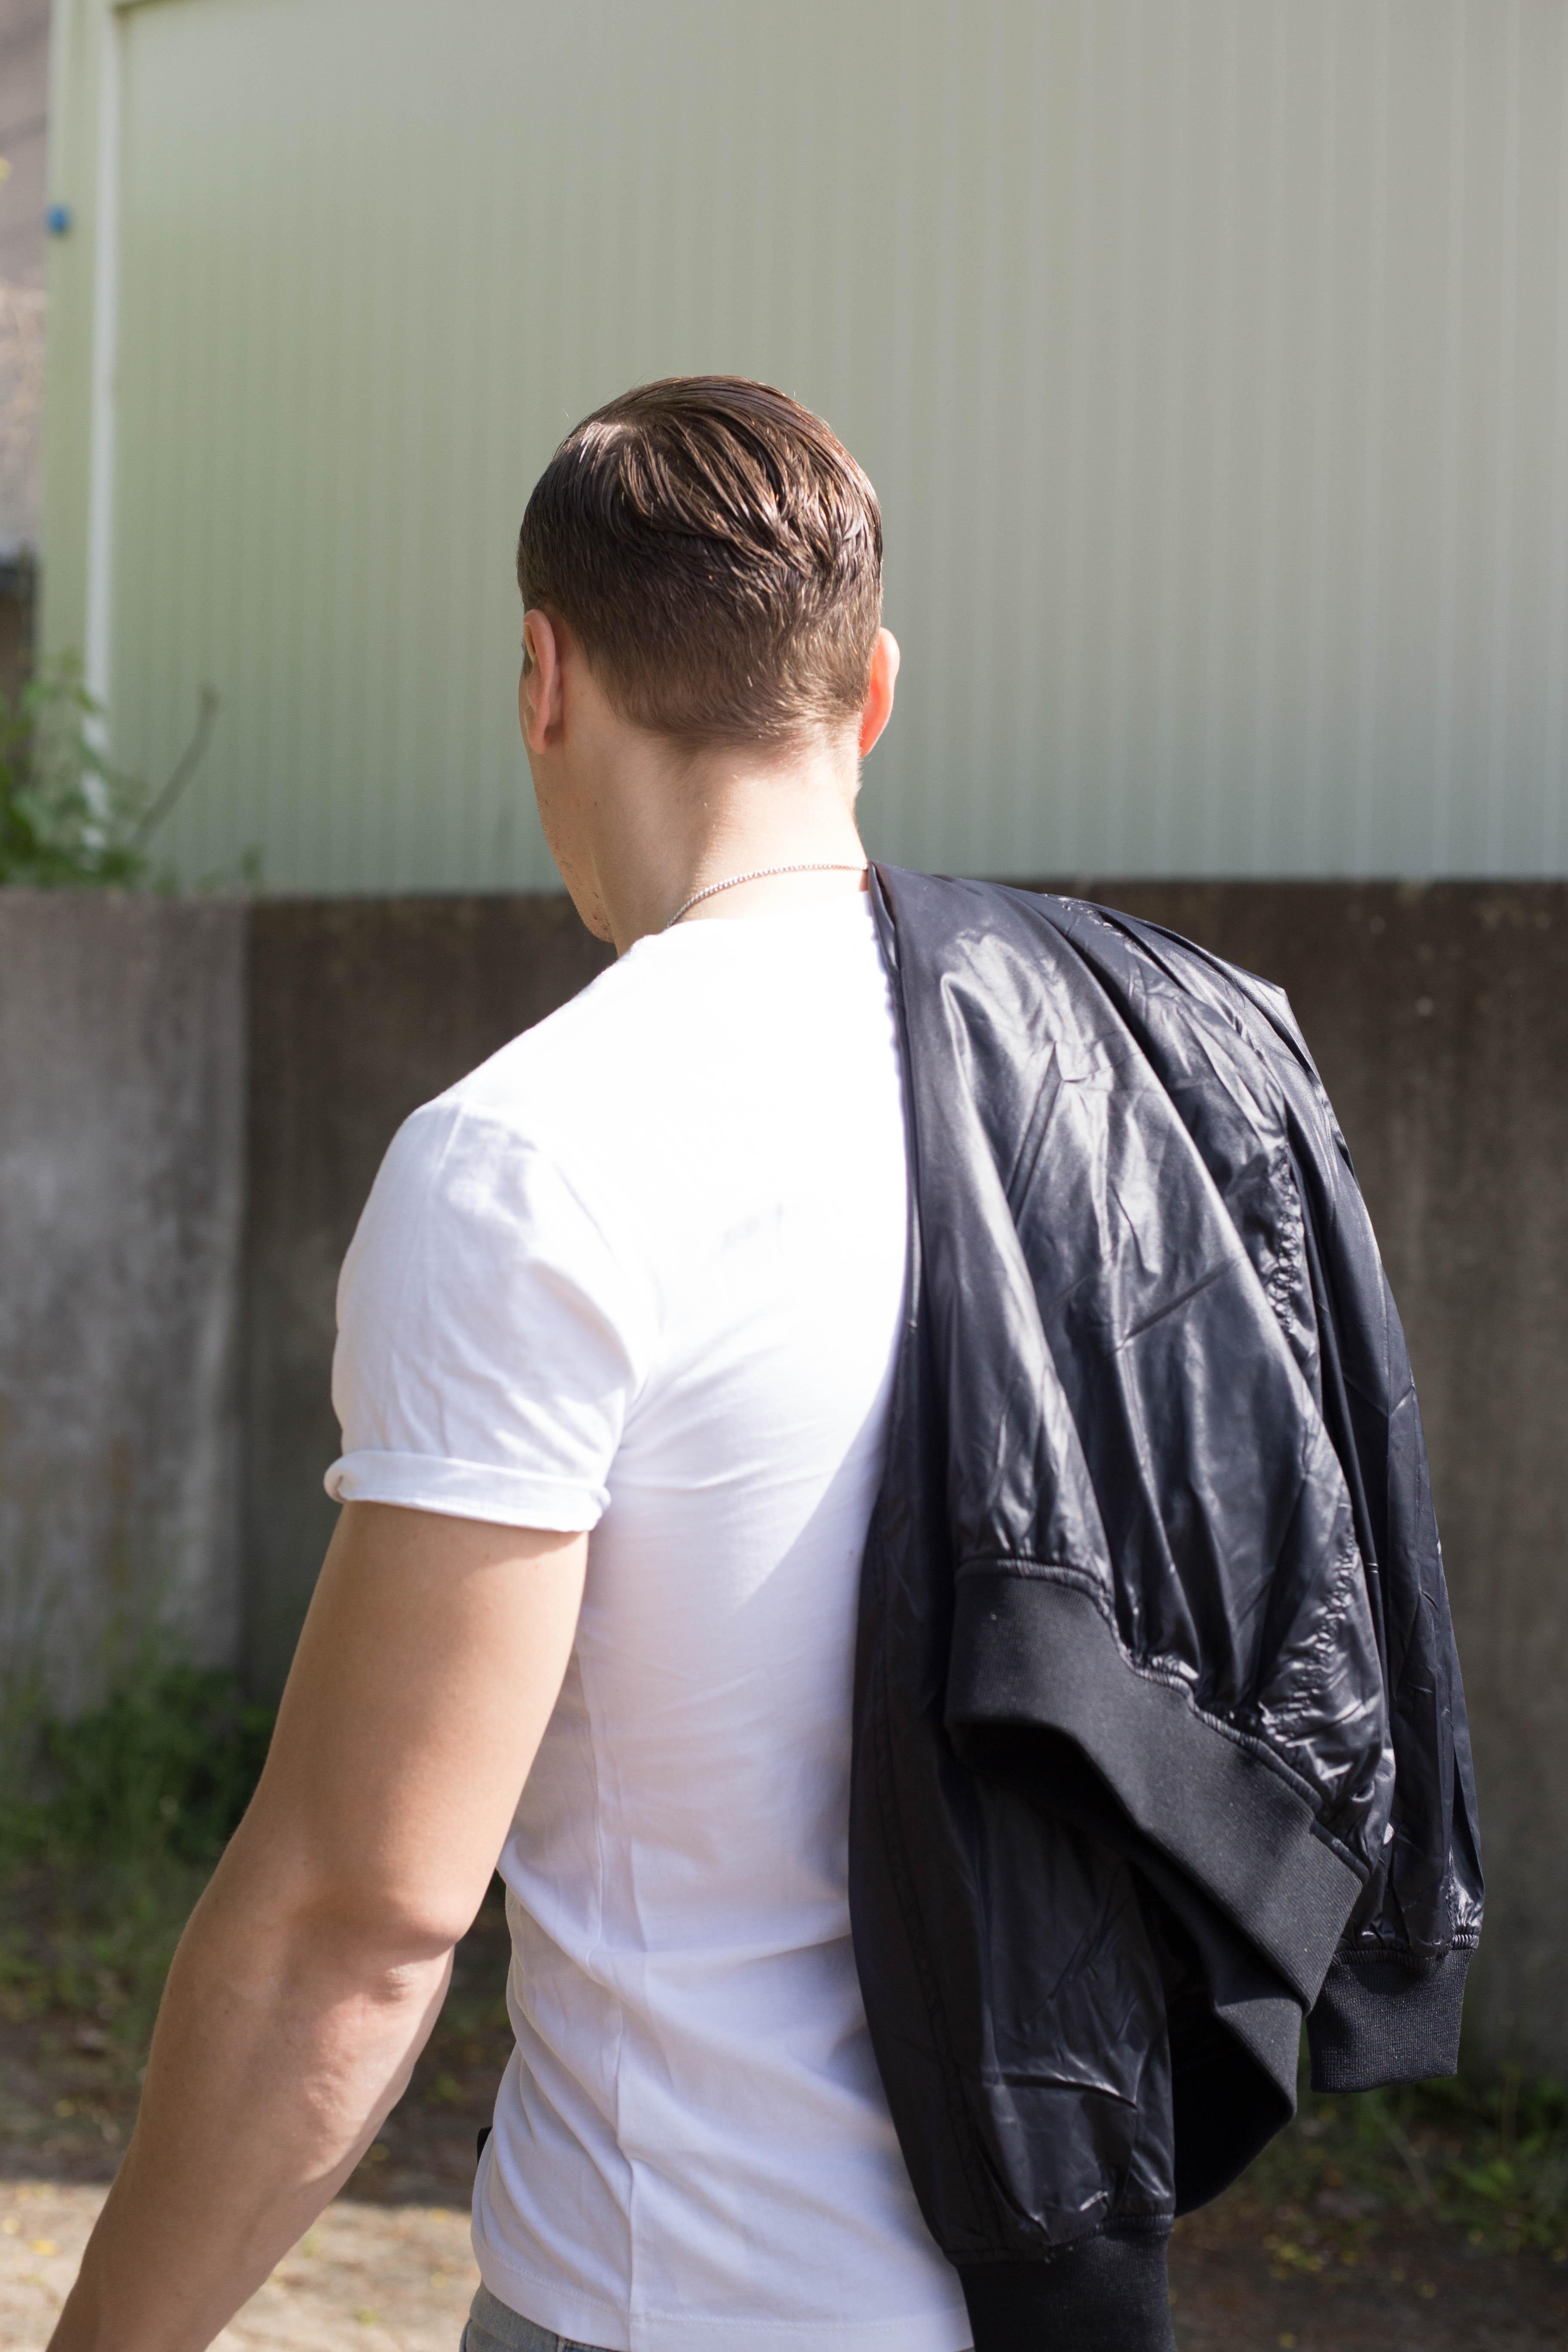 diesel-shirt-fashionlook-menfashion-männerblog-berlin-outfit_6743